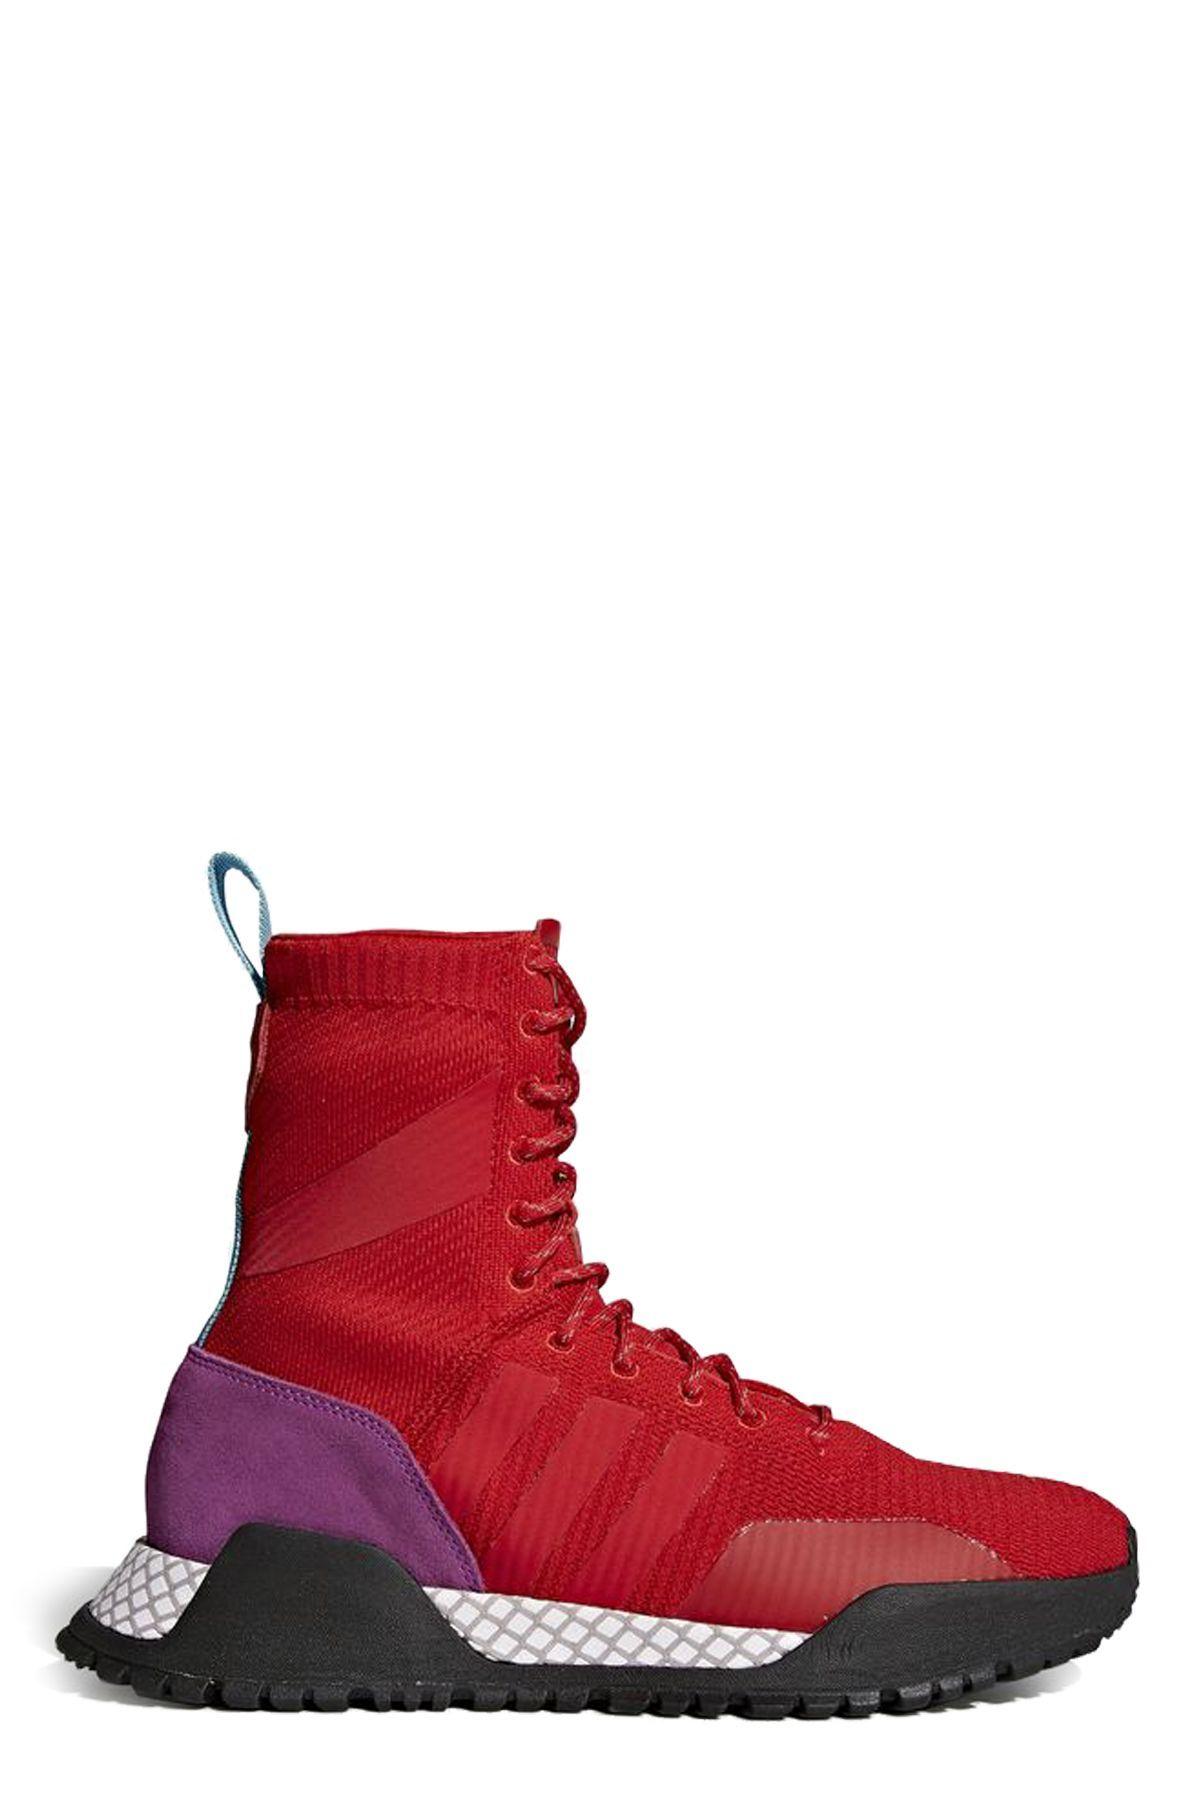 super popular 78a4b 272eb ADIDAS ORIGINALS BZ0611 F-1.3. adidasoriginals shoes